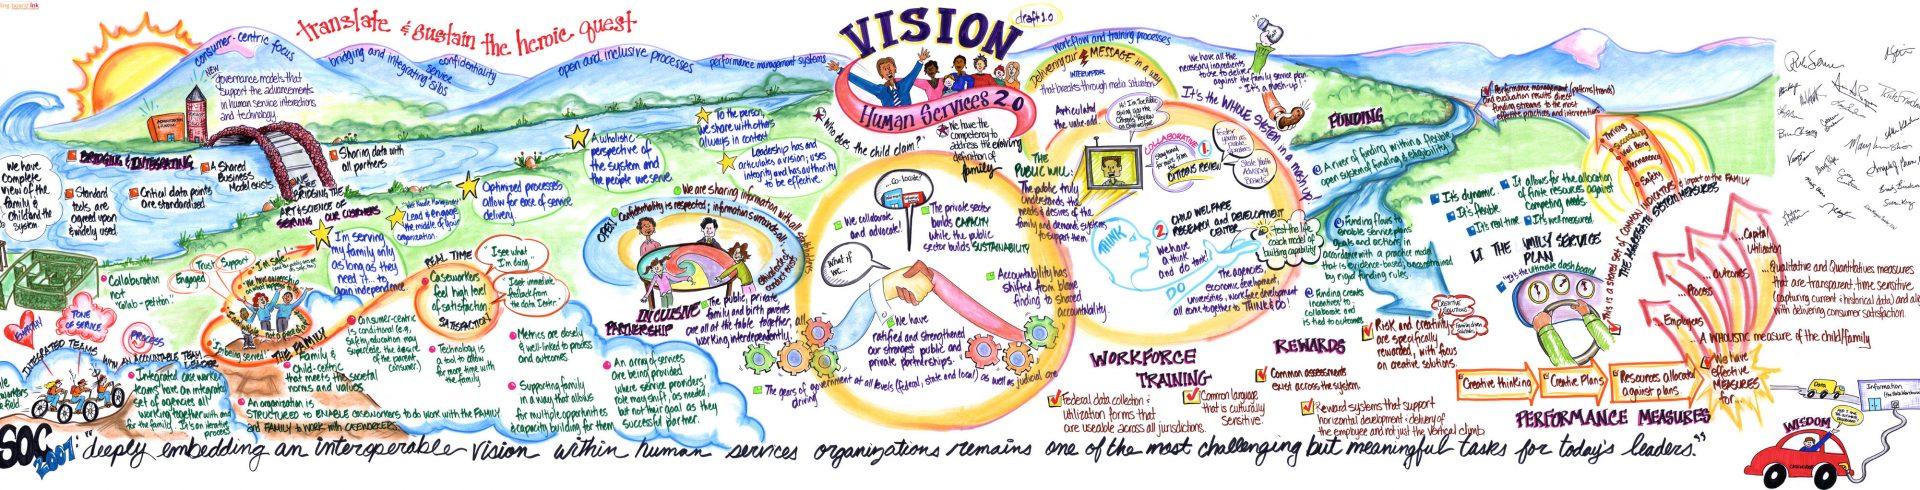 ACF Interoperability Initiative – Vision Ledger